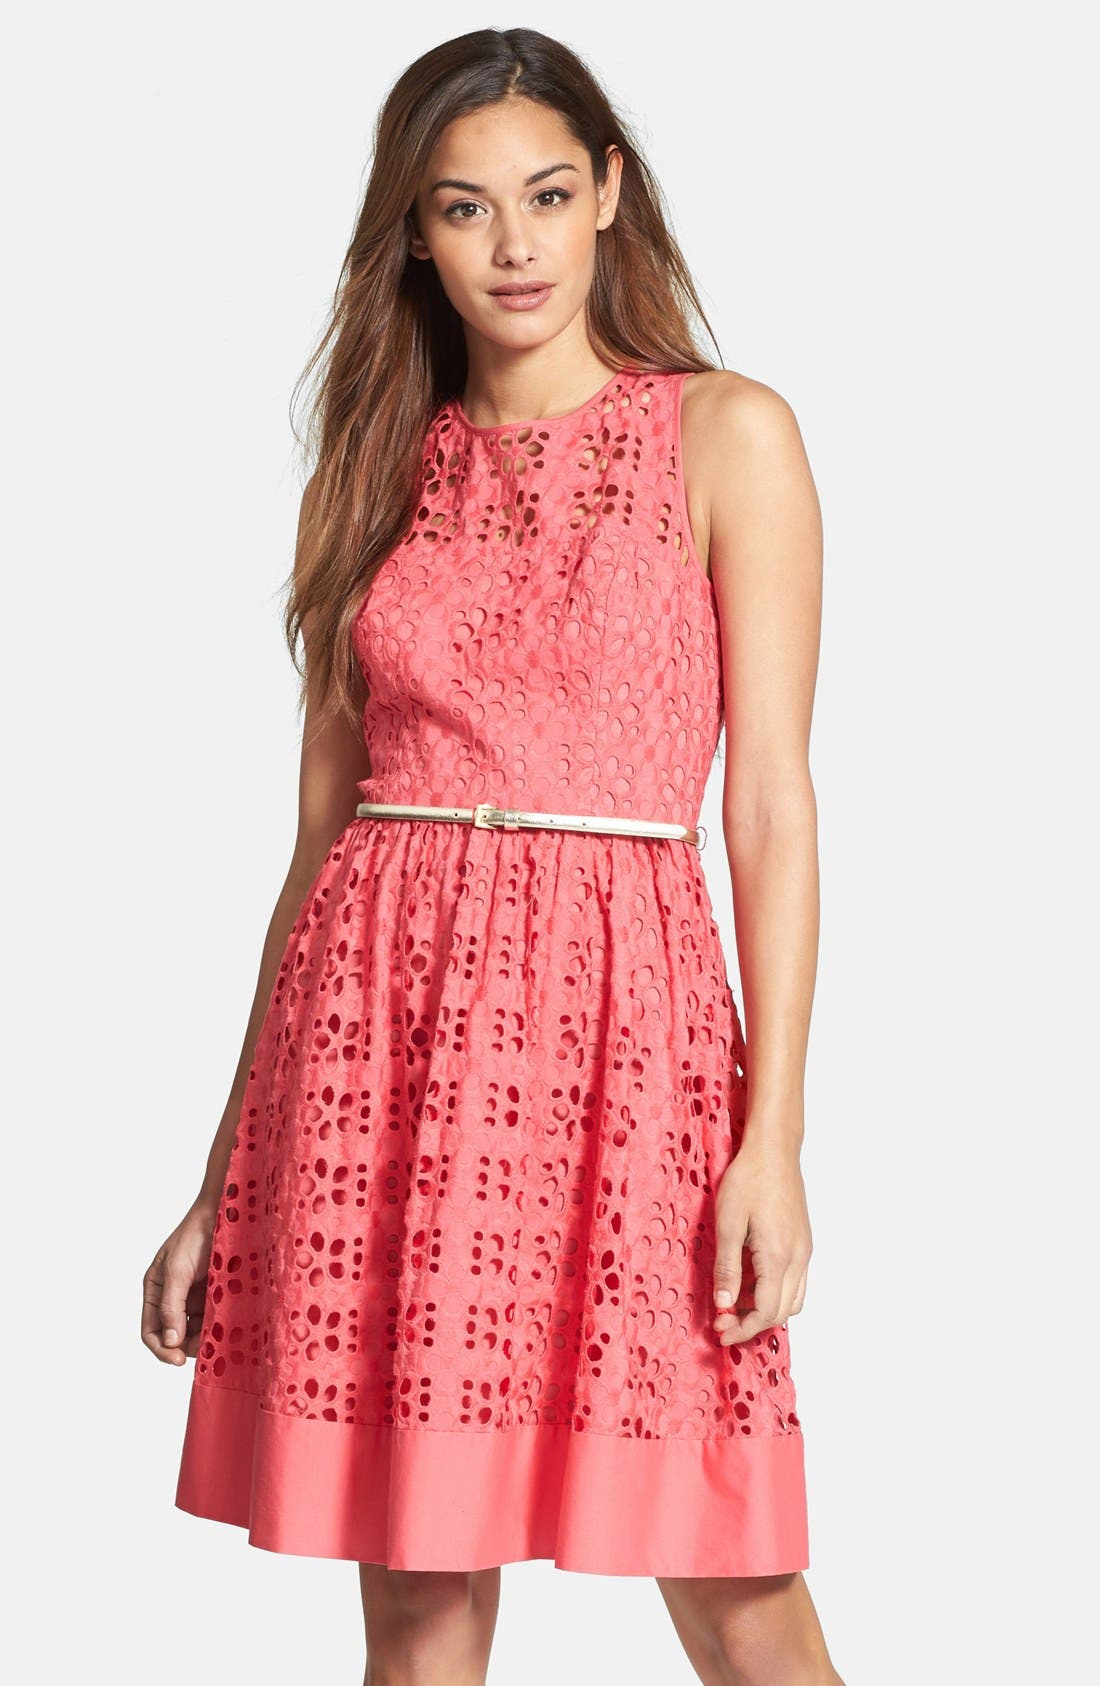 Main Image - Eliza J Cotton Eyelet Belted Fit & Flare Dress (Regular & Petite)